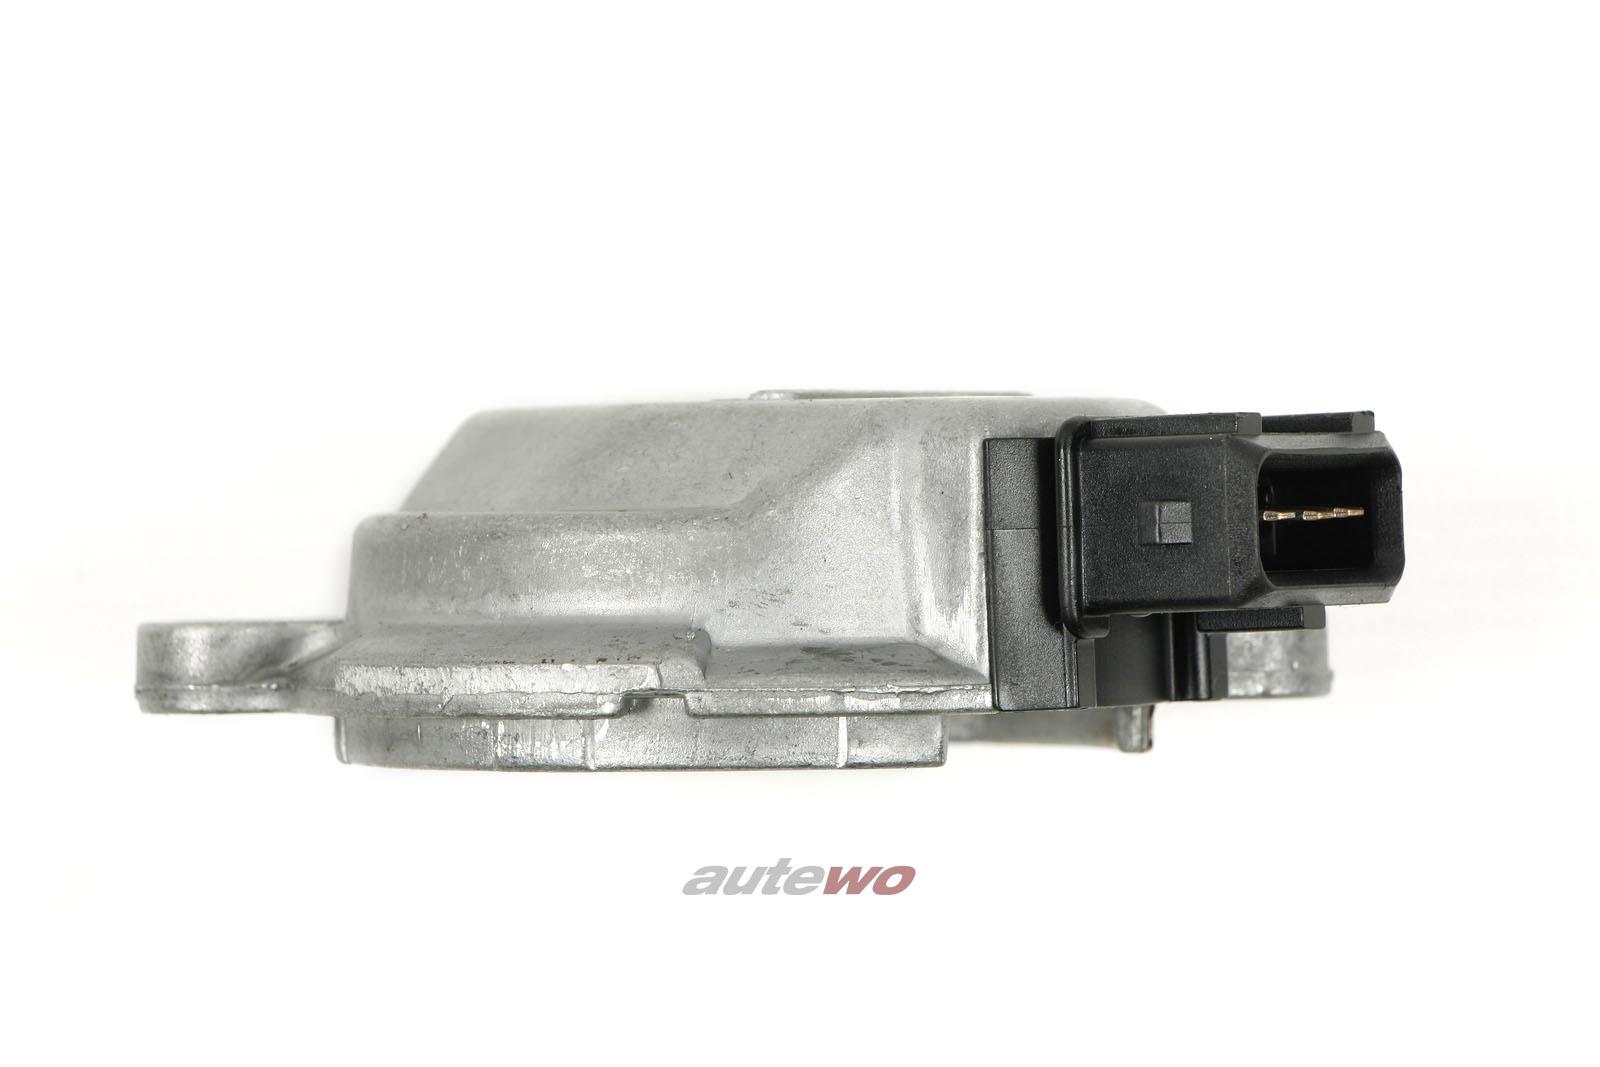 058905161B NEU Audi A3/S3 8L/A4/S4/RS4 B5/A6/S6/RS6 4B/A8/S8 D2/TT Hallgeber